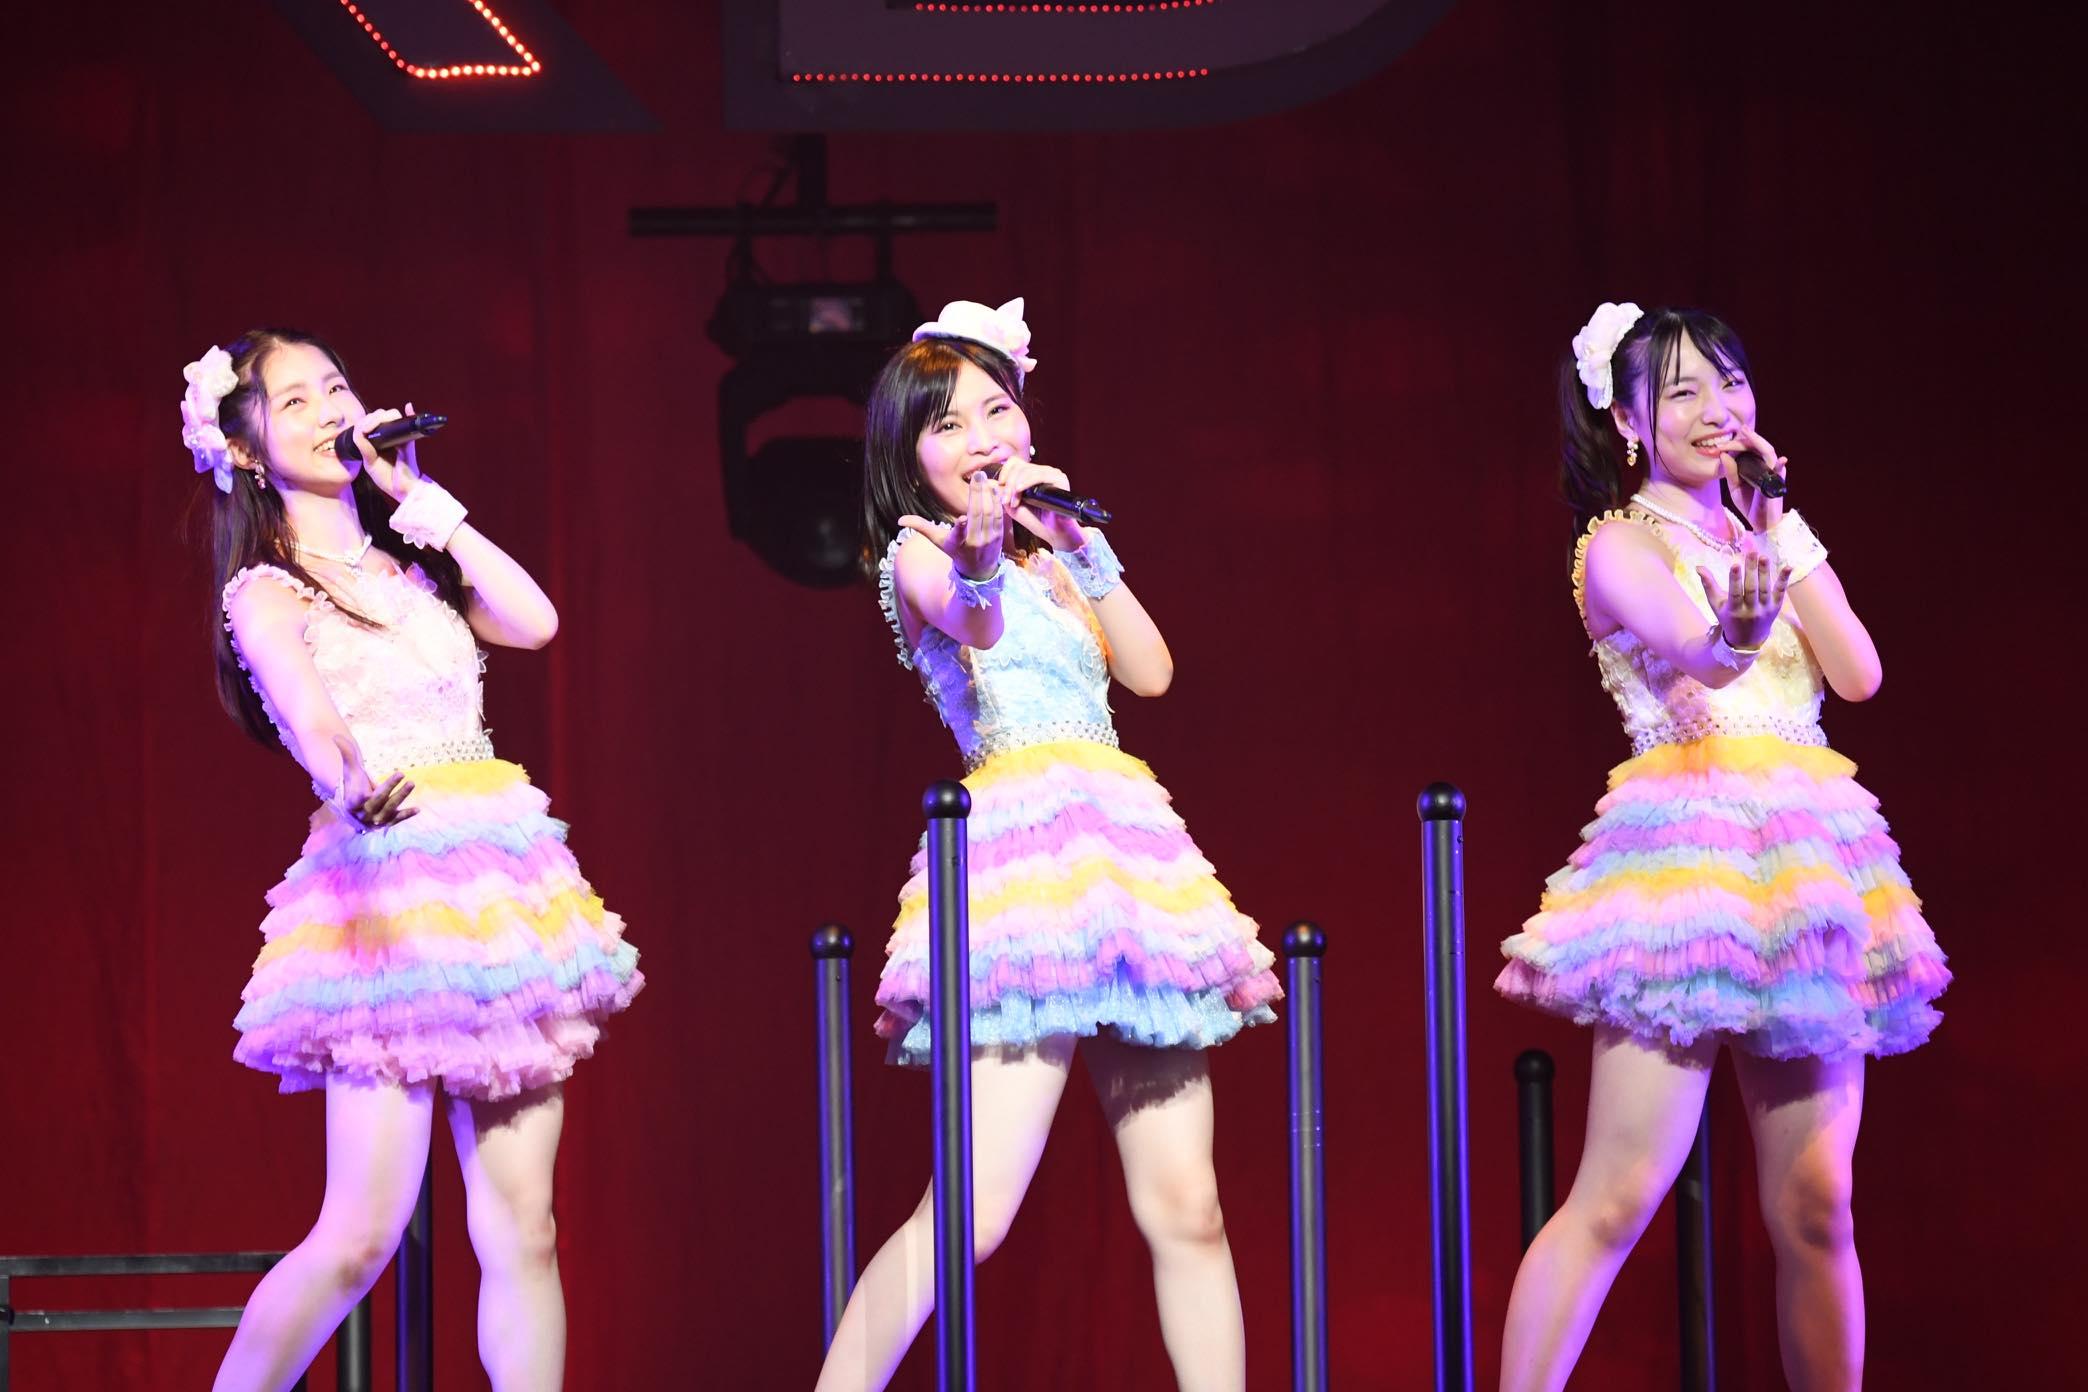 AKB48全国ツアー「神奈川公演」開催、チームBとチーム4のパワーが炸裂!【写真17枚】の画像005